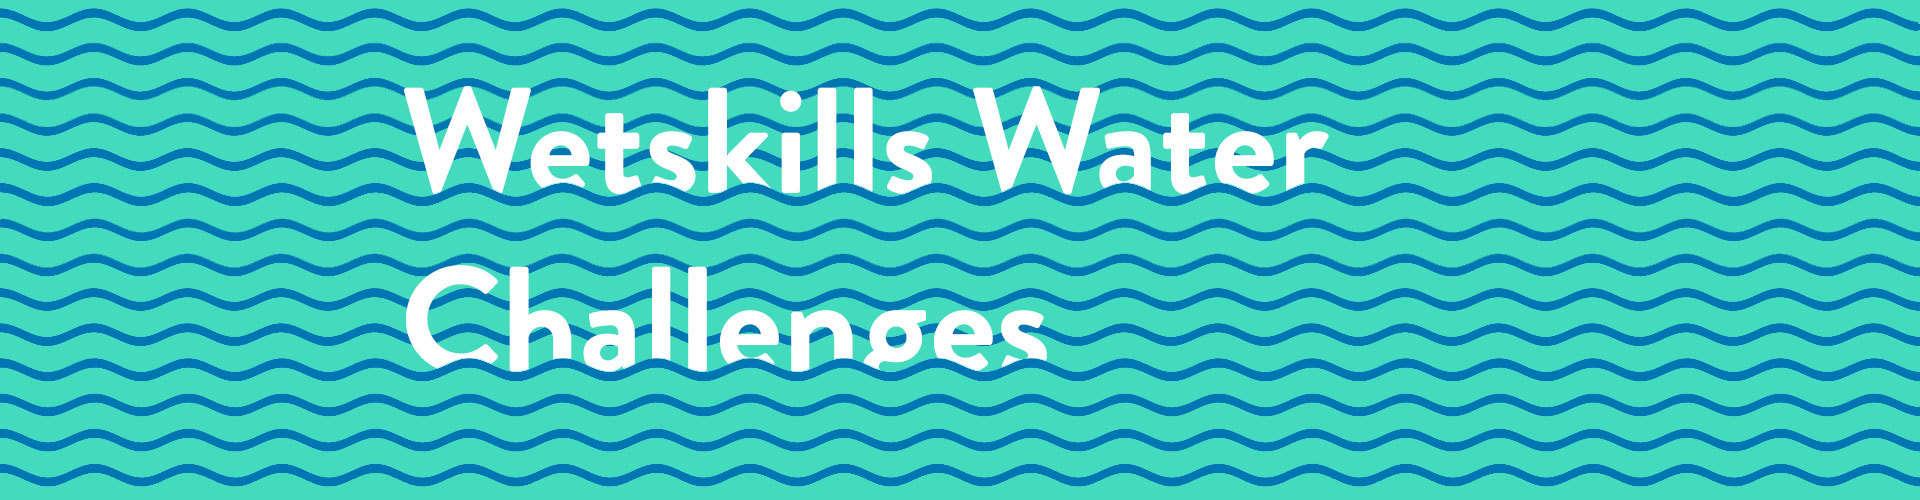 Wetskills_Challenges